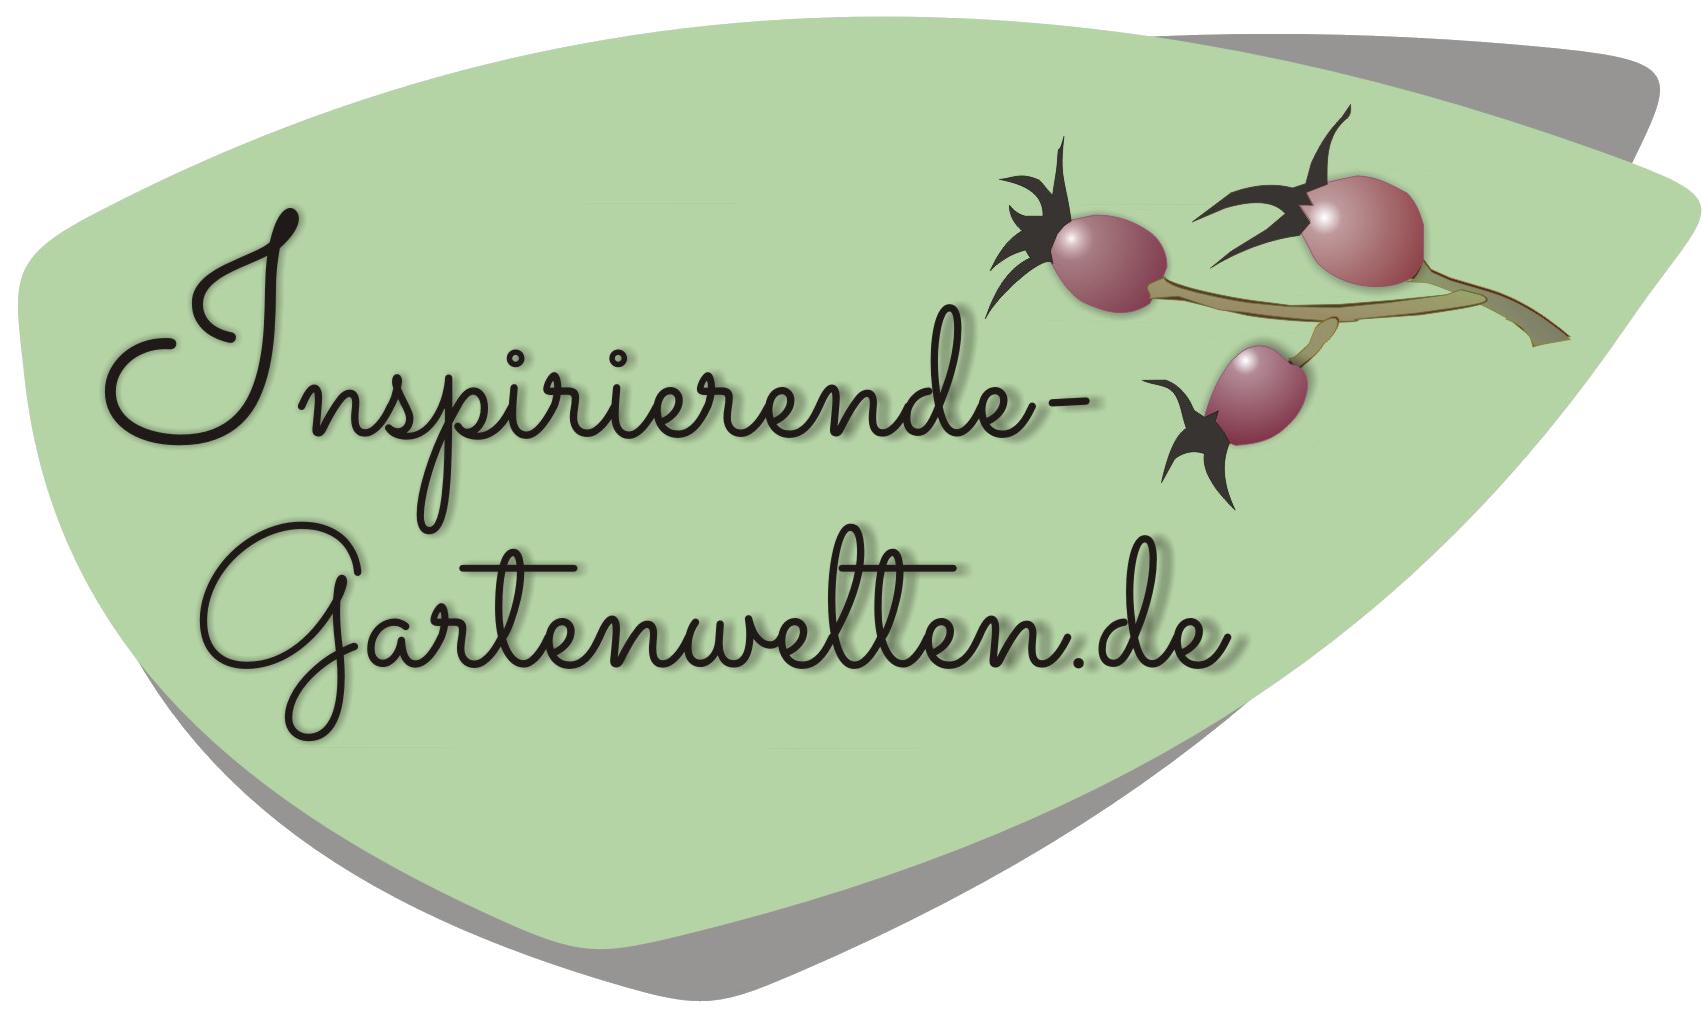 Link Inspirierende-Gartenwelten.de